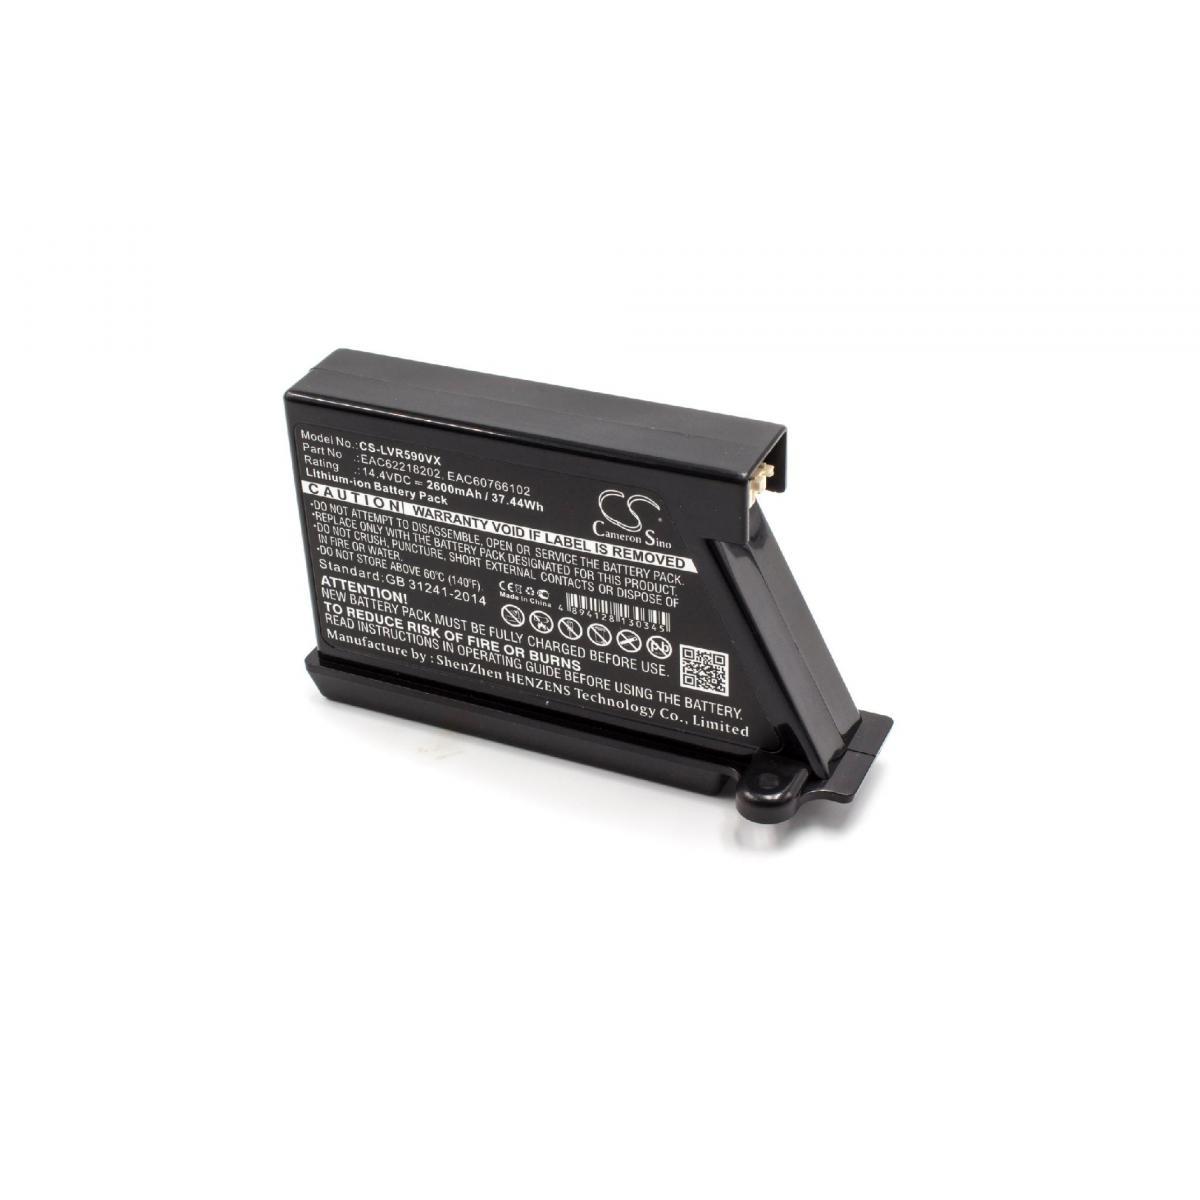 Vhbw vhbw Batterie compatible avec LG HOM-BOT VR66801VMIP, VR66802VMWP, VR7412RB robot électroménager (2600mAh, 14,4V, Li-ion